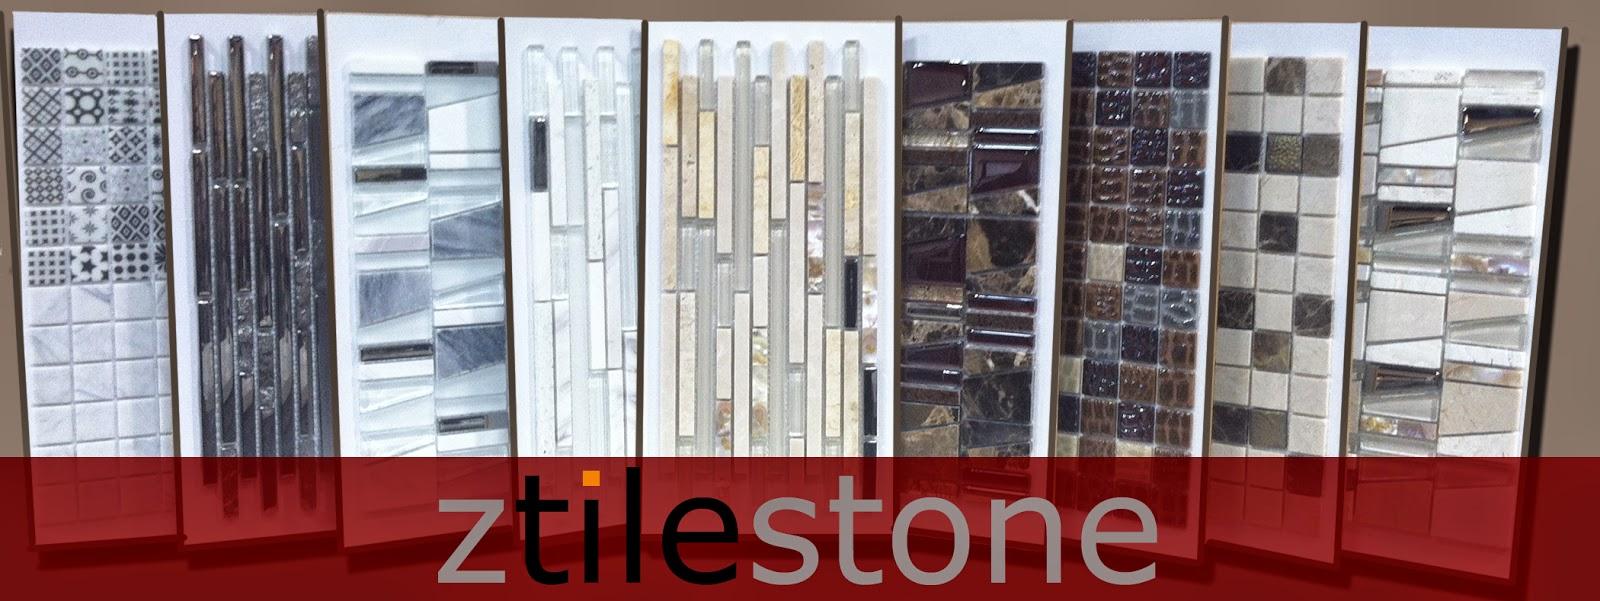 1768 Thirteenth St New Tile Ztilestone Only At Cherry City Interiors Design